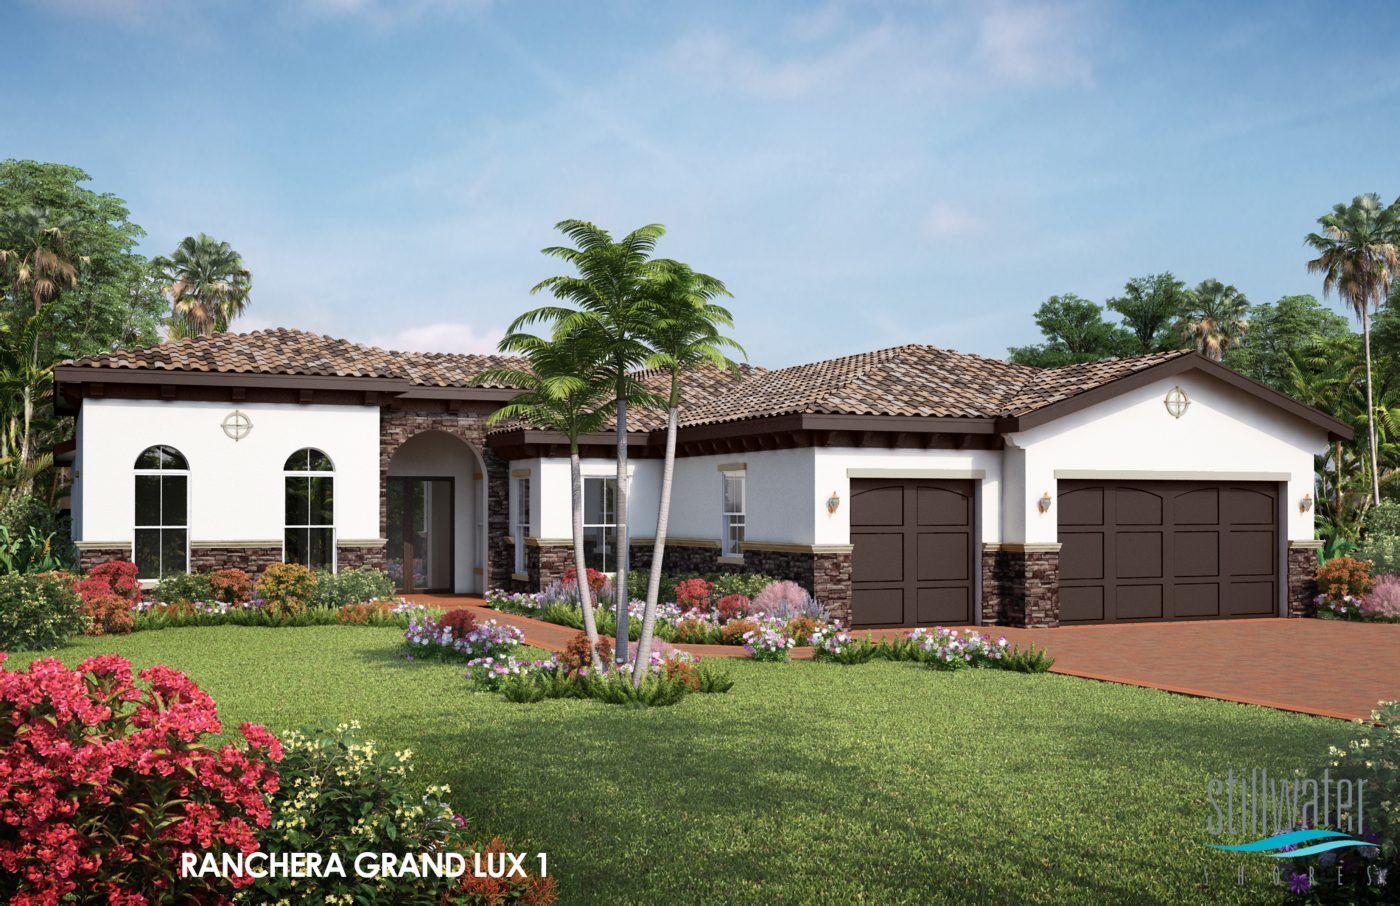 Single Family for Sale at Stillwater Shores - Ranchera Grand Lux 5400 Sw 70th Avenue Davie, Florida 33314 United States